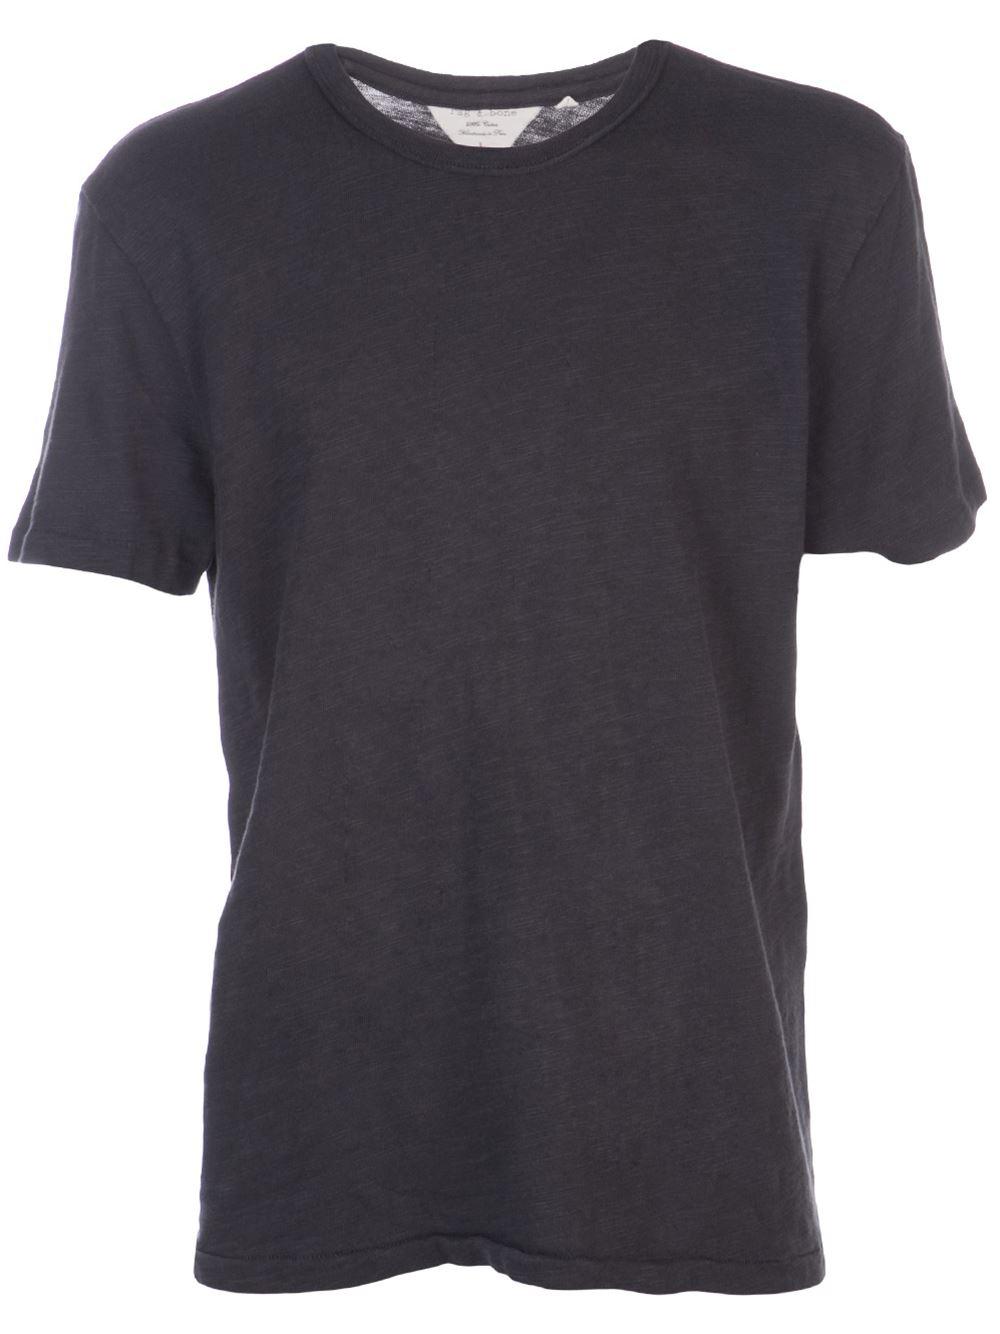 Rag bone basic t shirt in black for men lyst for Rag and bone t shirts